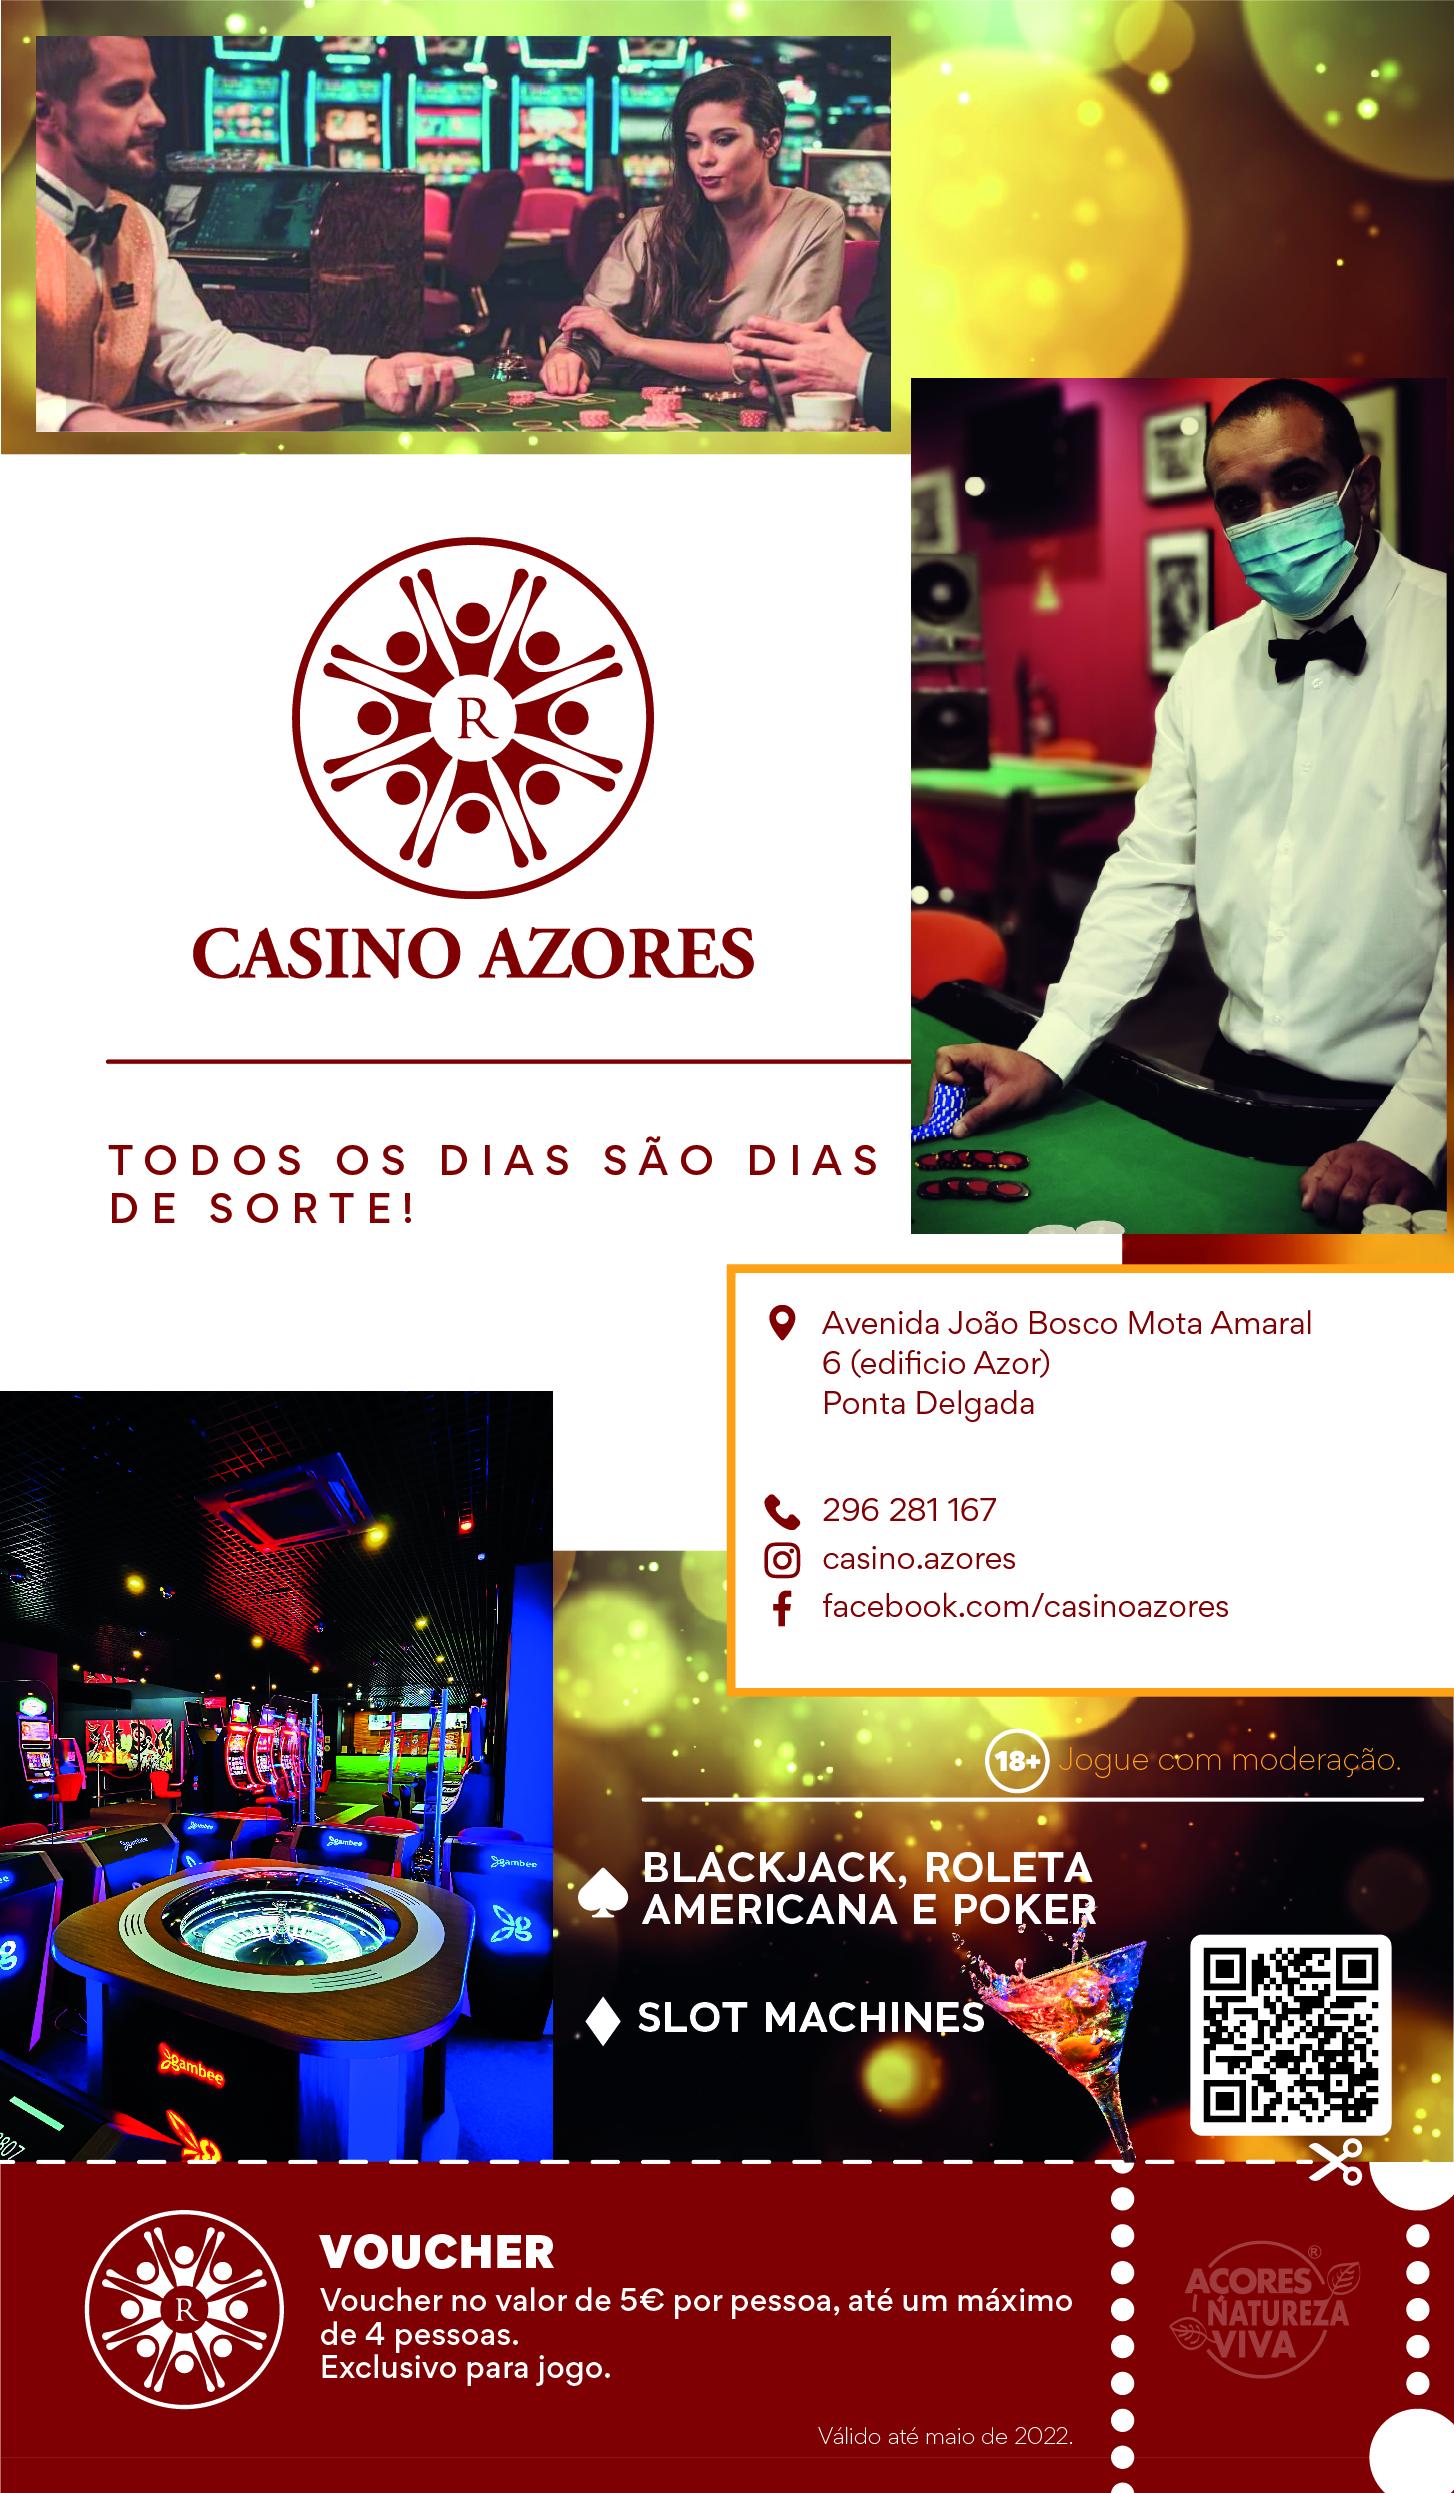 Casino Azores